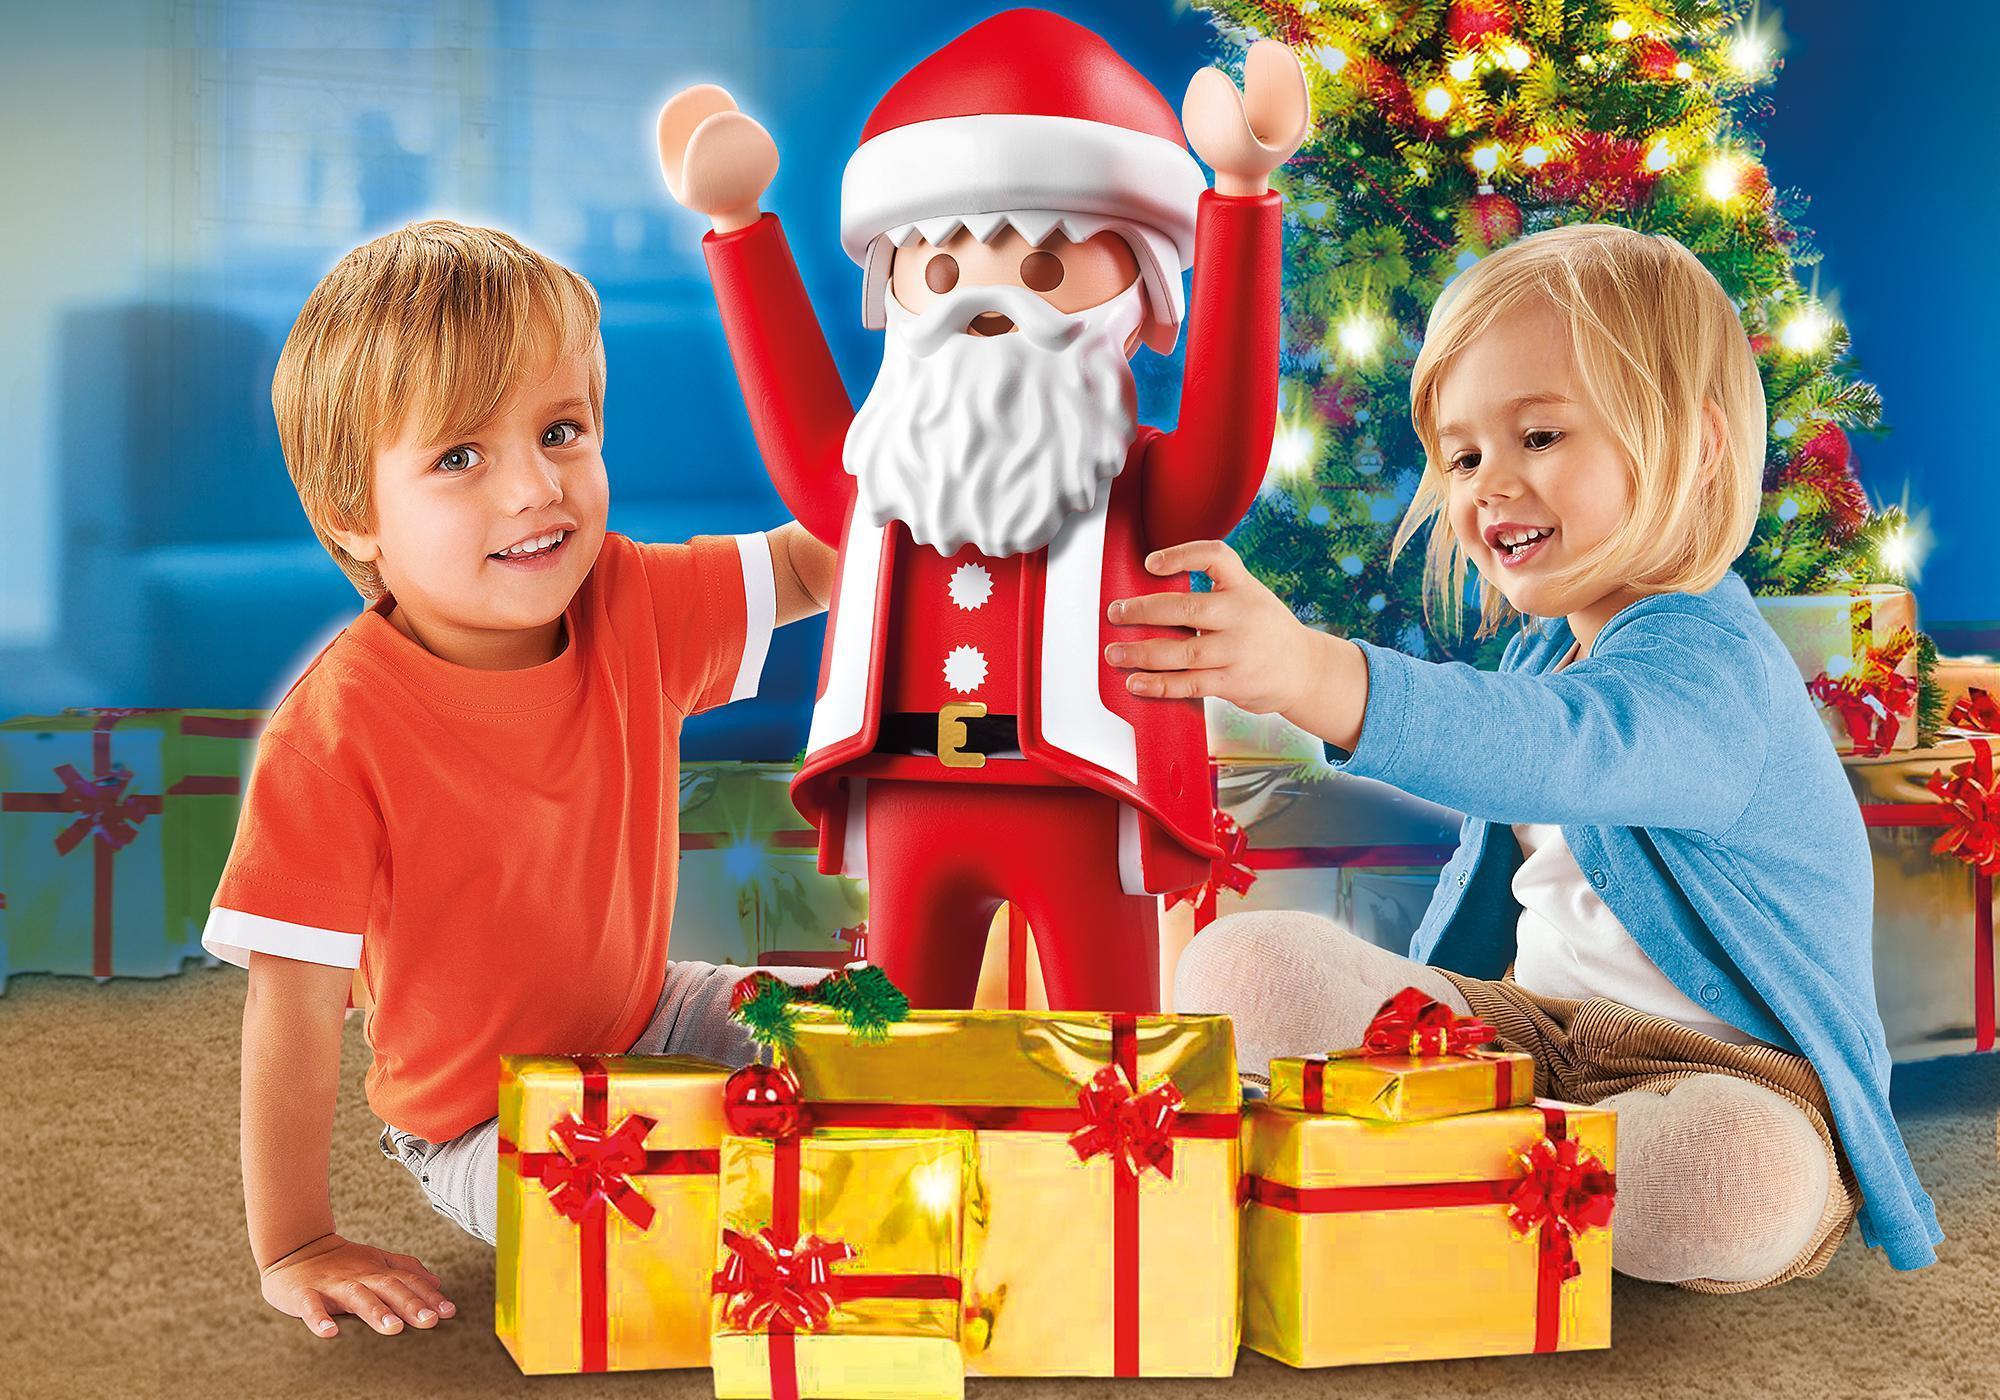 playmobil xxl santa claus 6629 playmobil usa